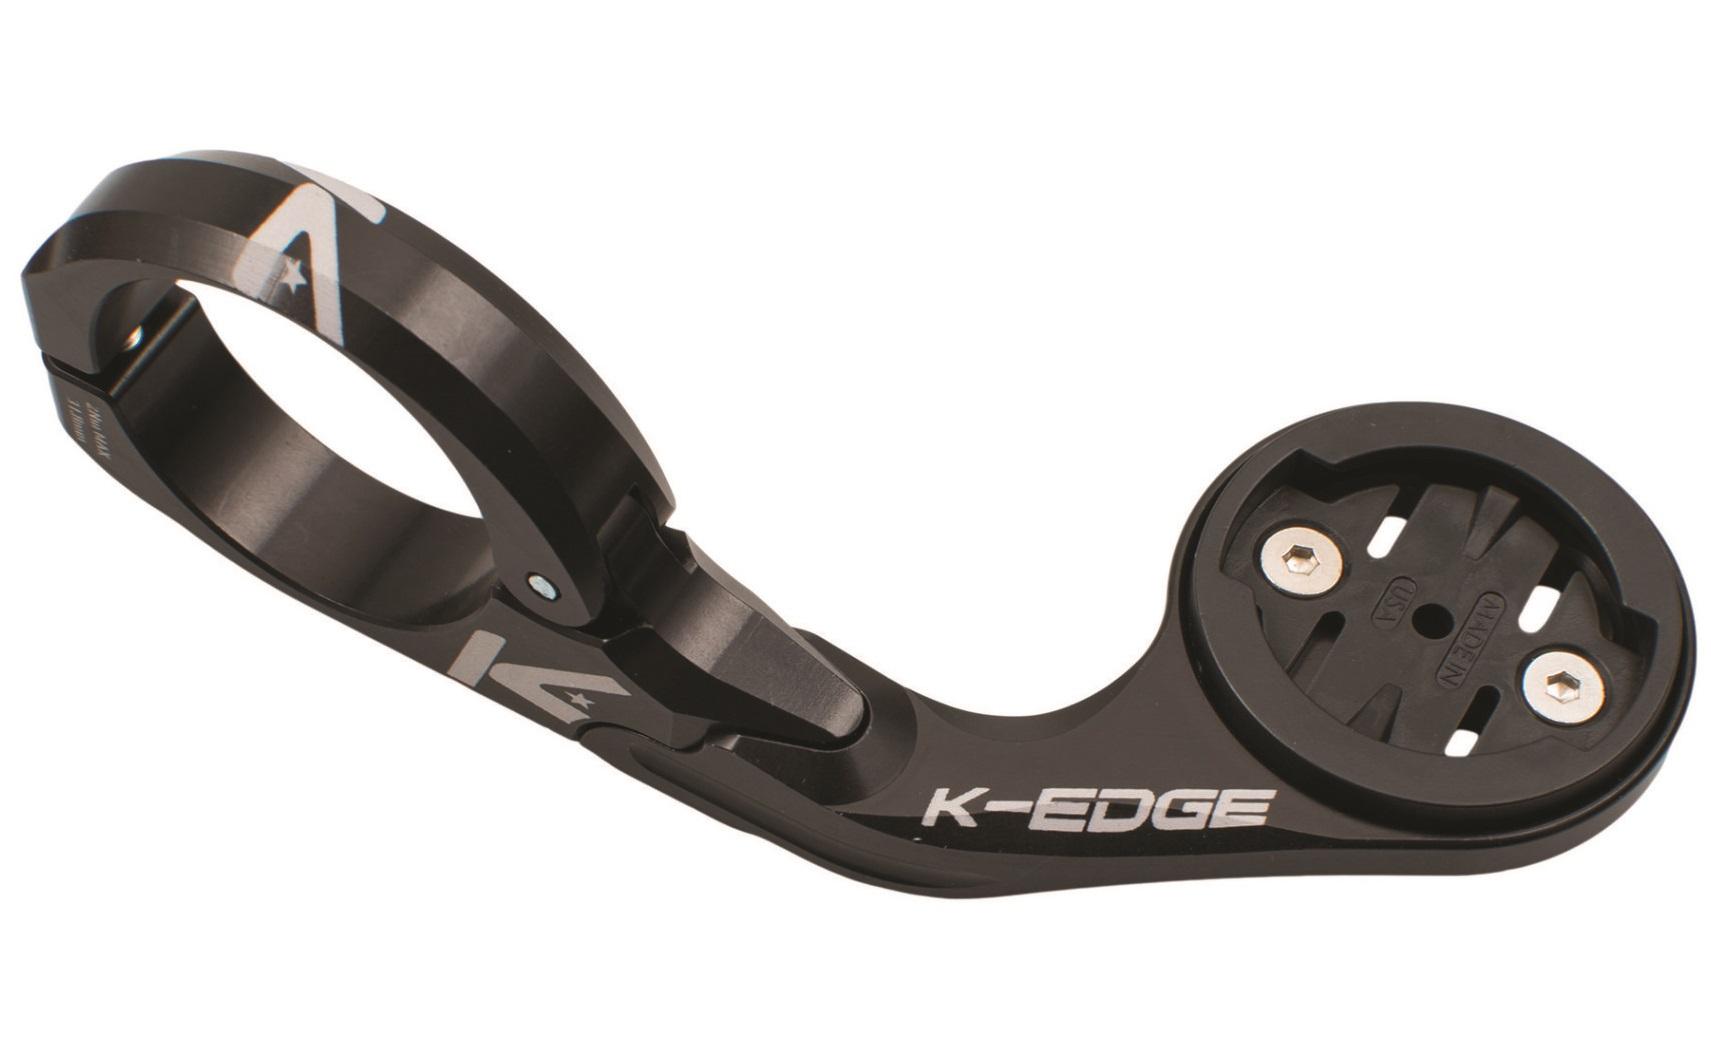 nosilec k-edge k13-1500 garmin mount black 31,8mm